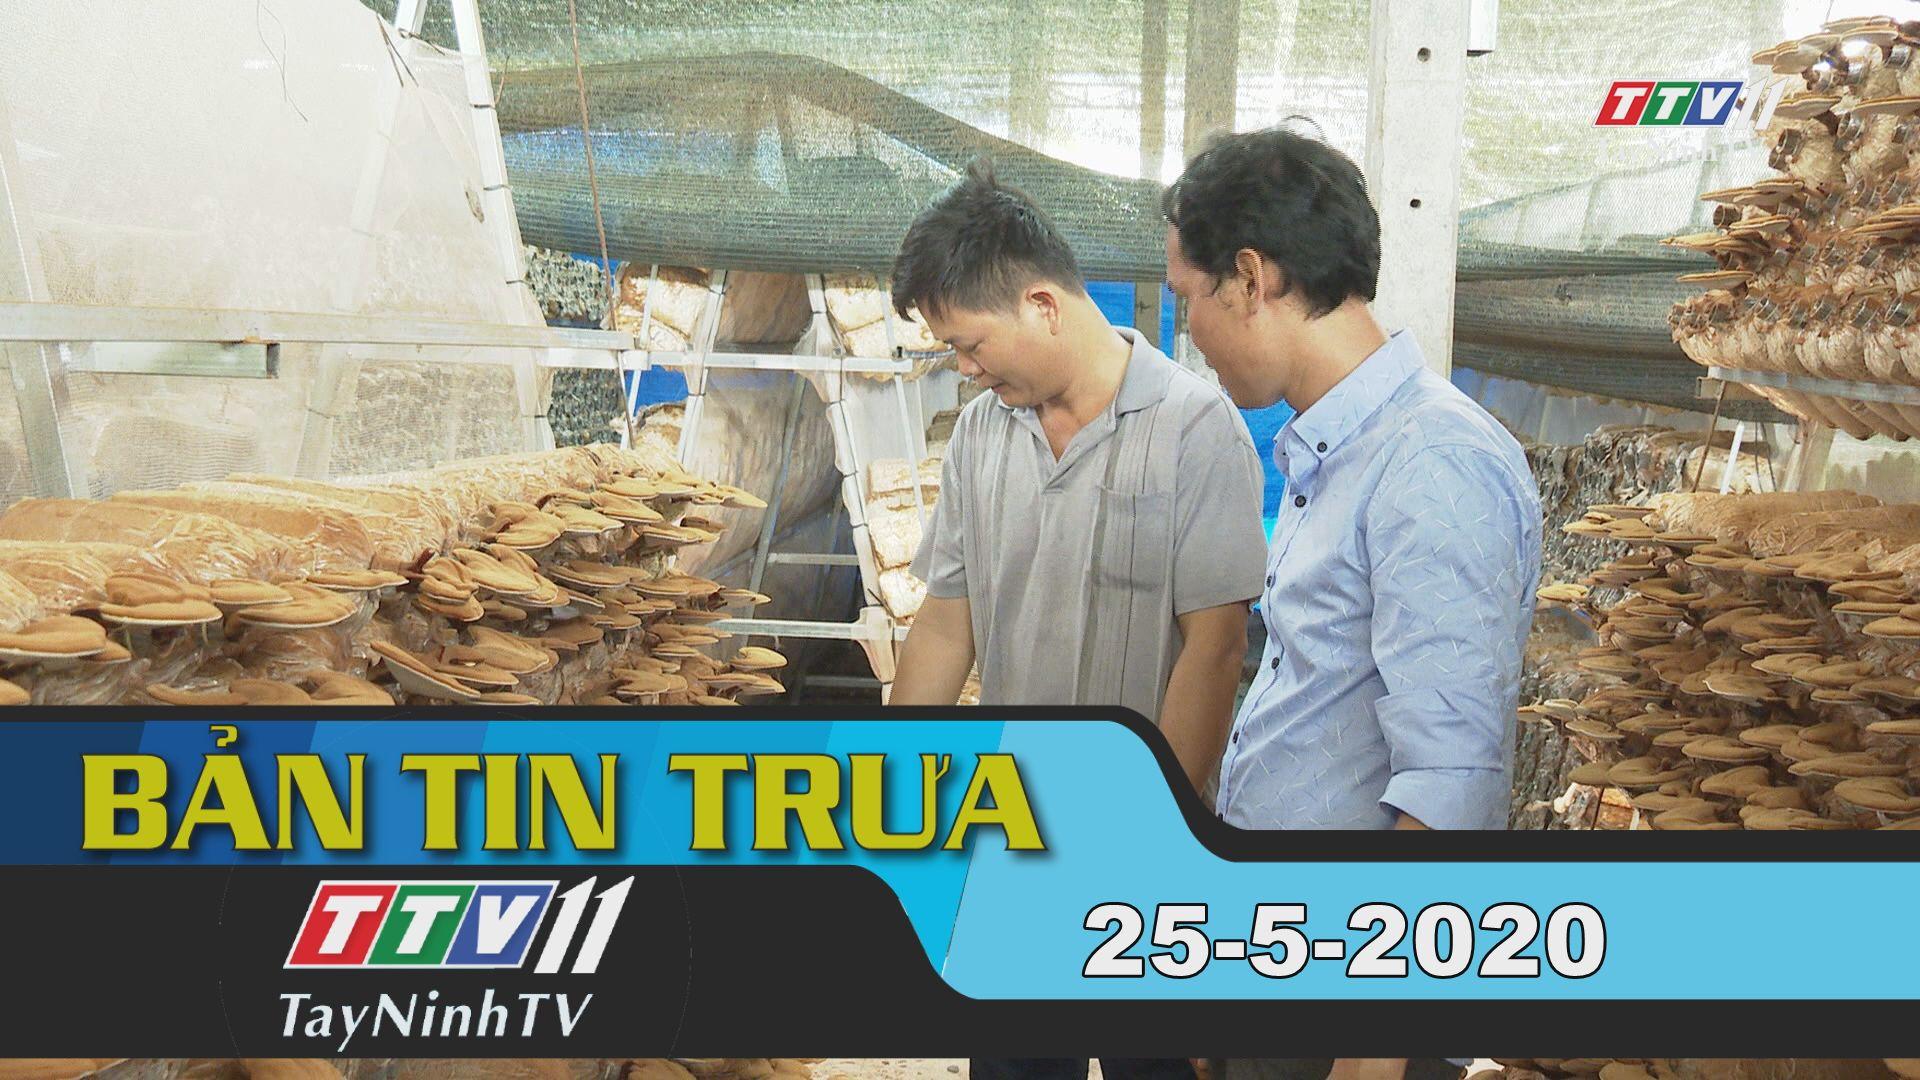 Bản tin trưa 25-5-2020 | Tin tức hôm nay | TayNinhTV